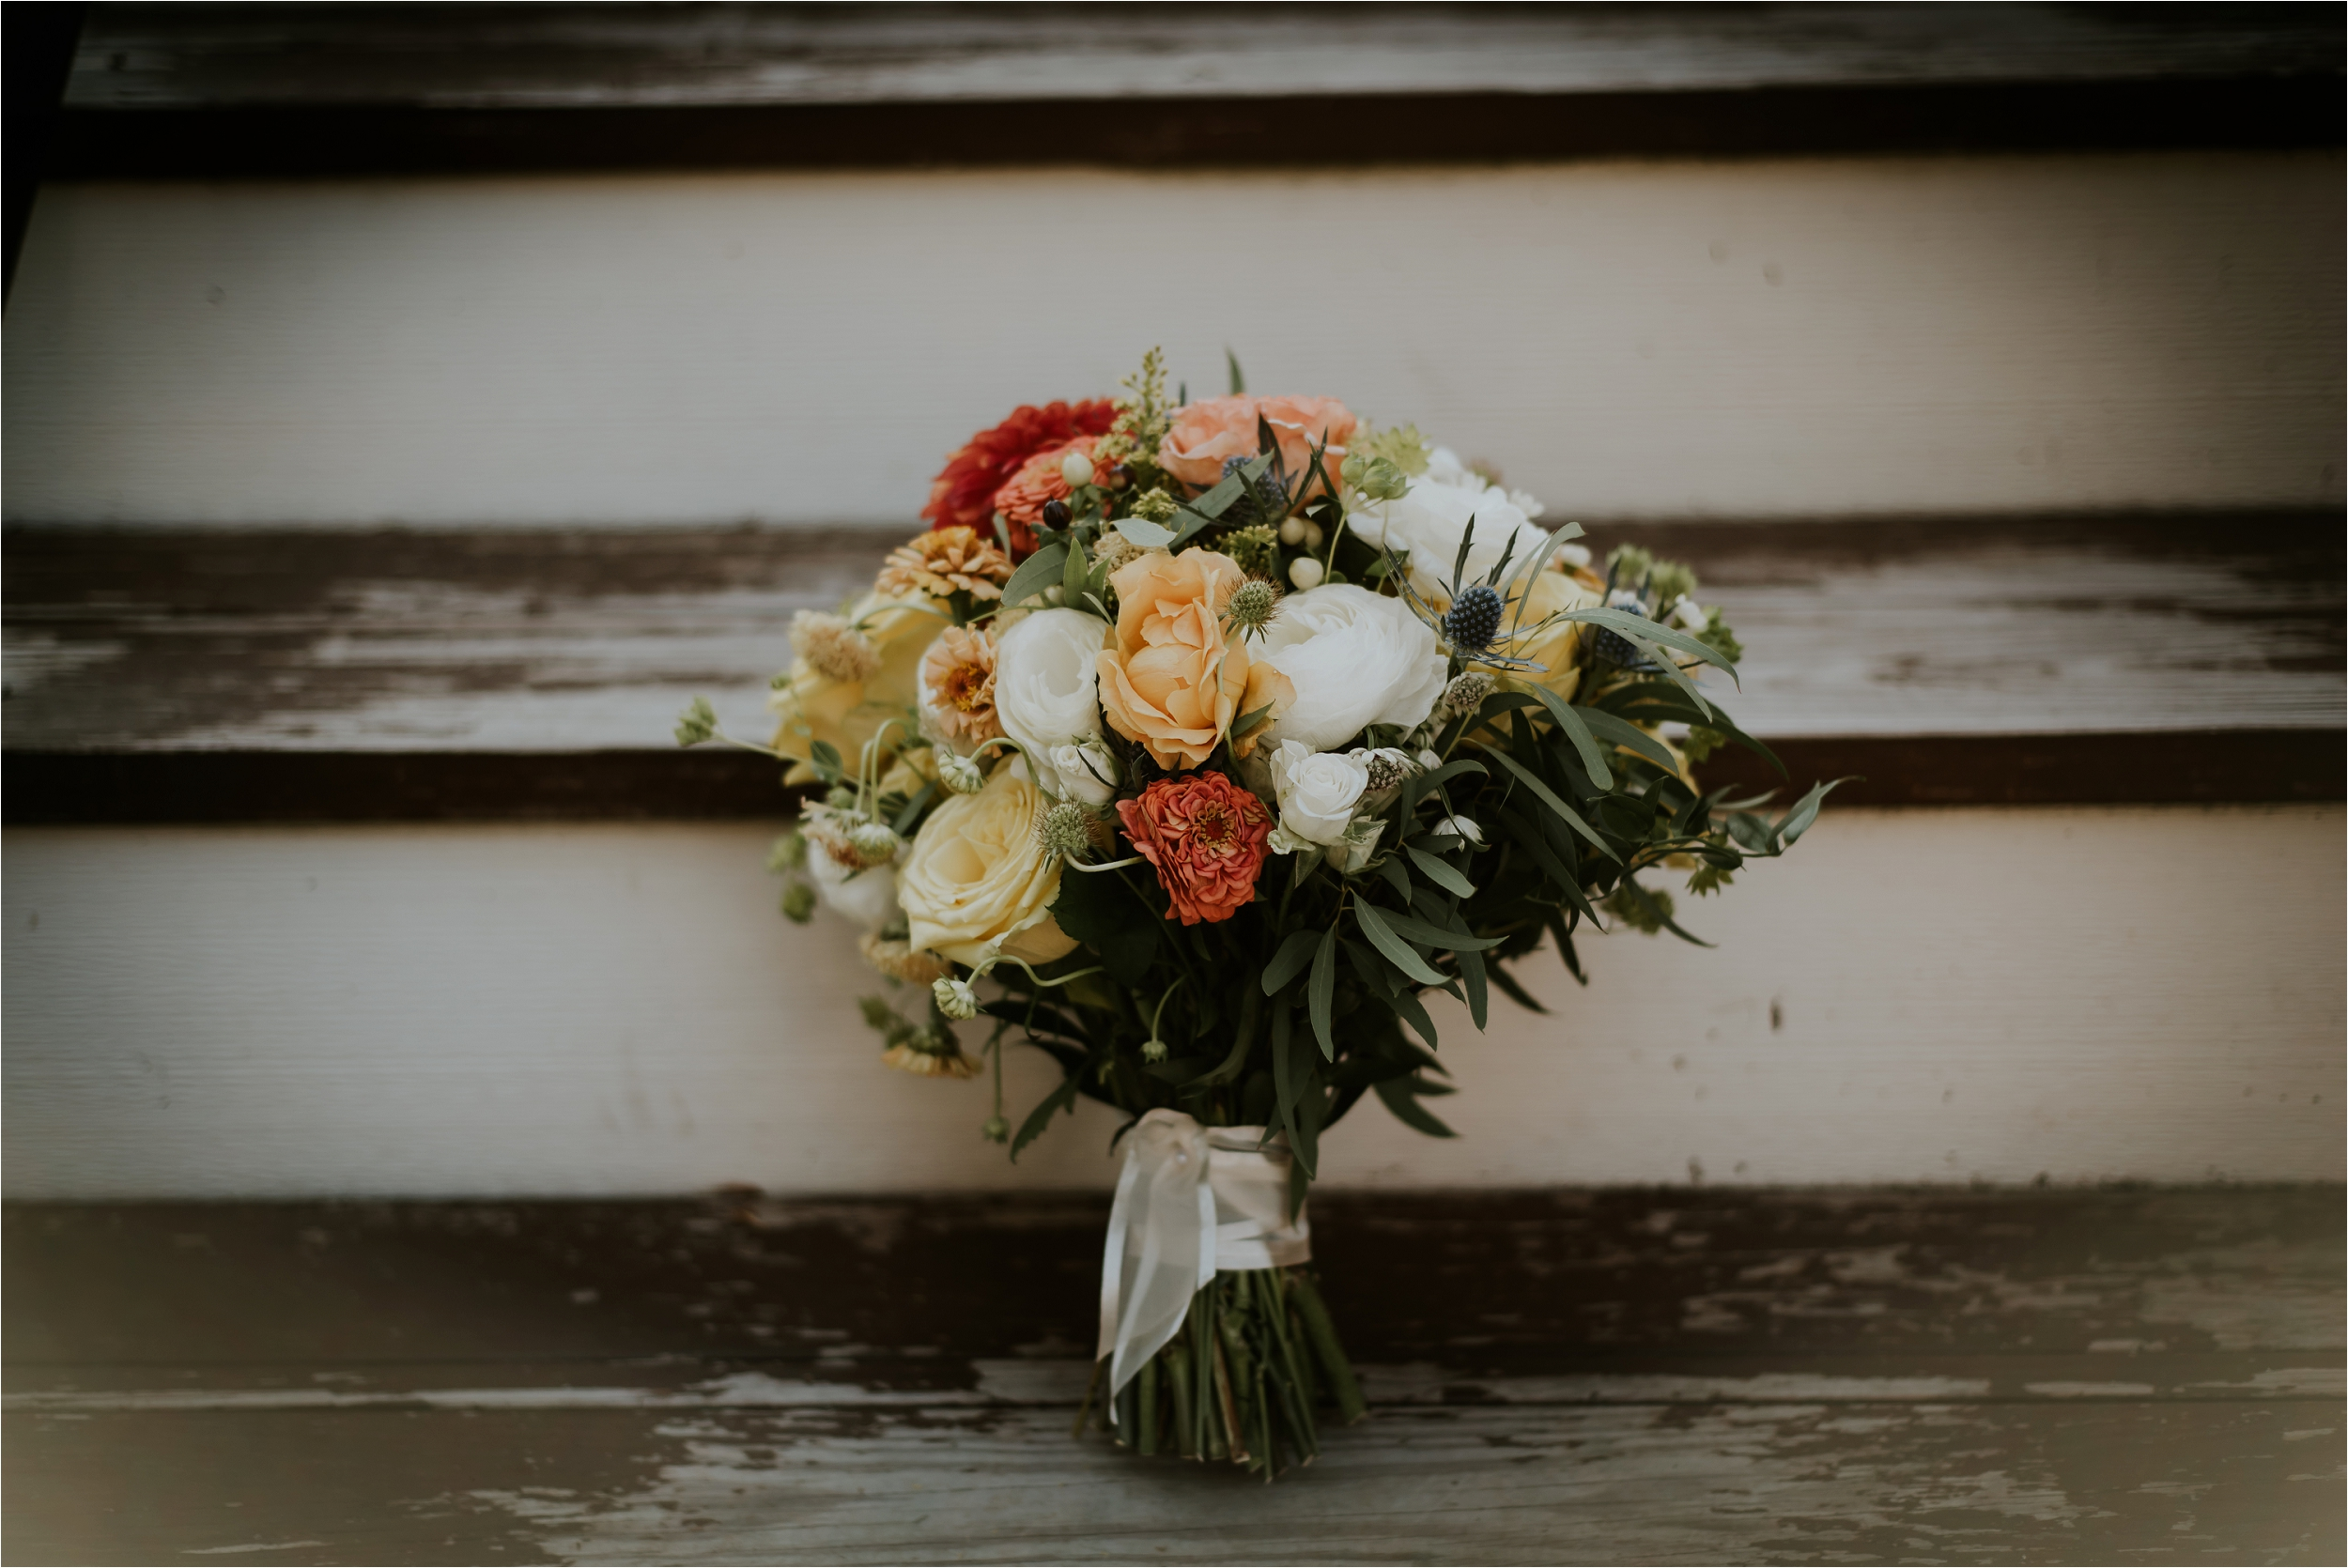 Dave & Daleena - For Florist_0014.jpg